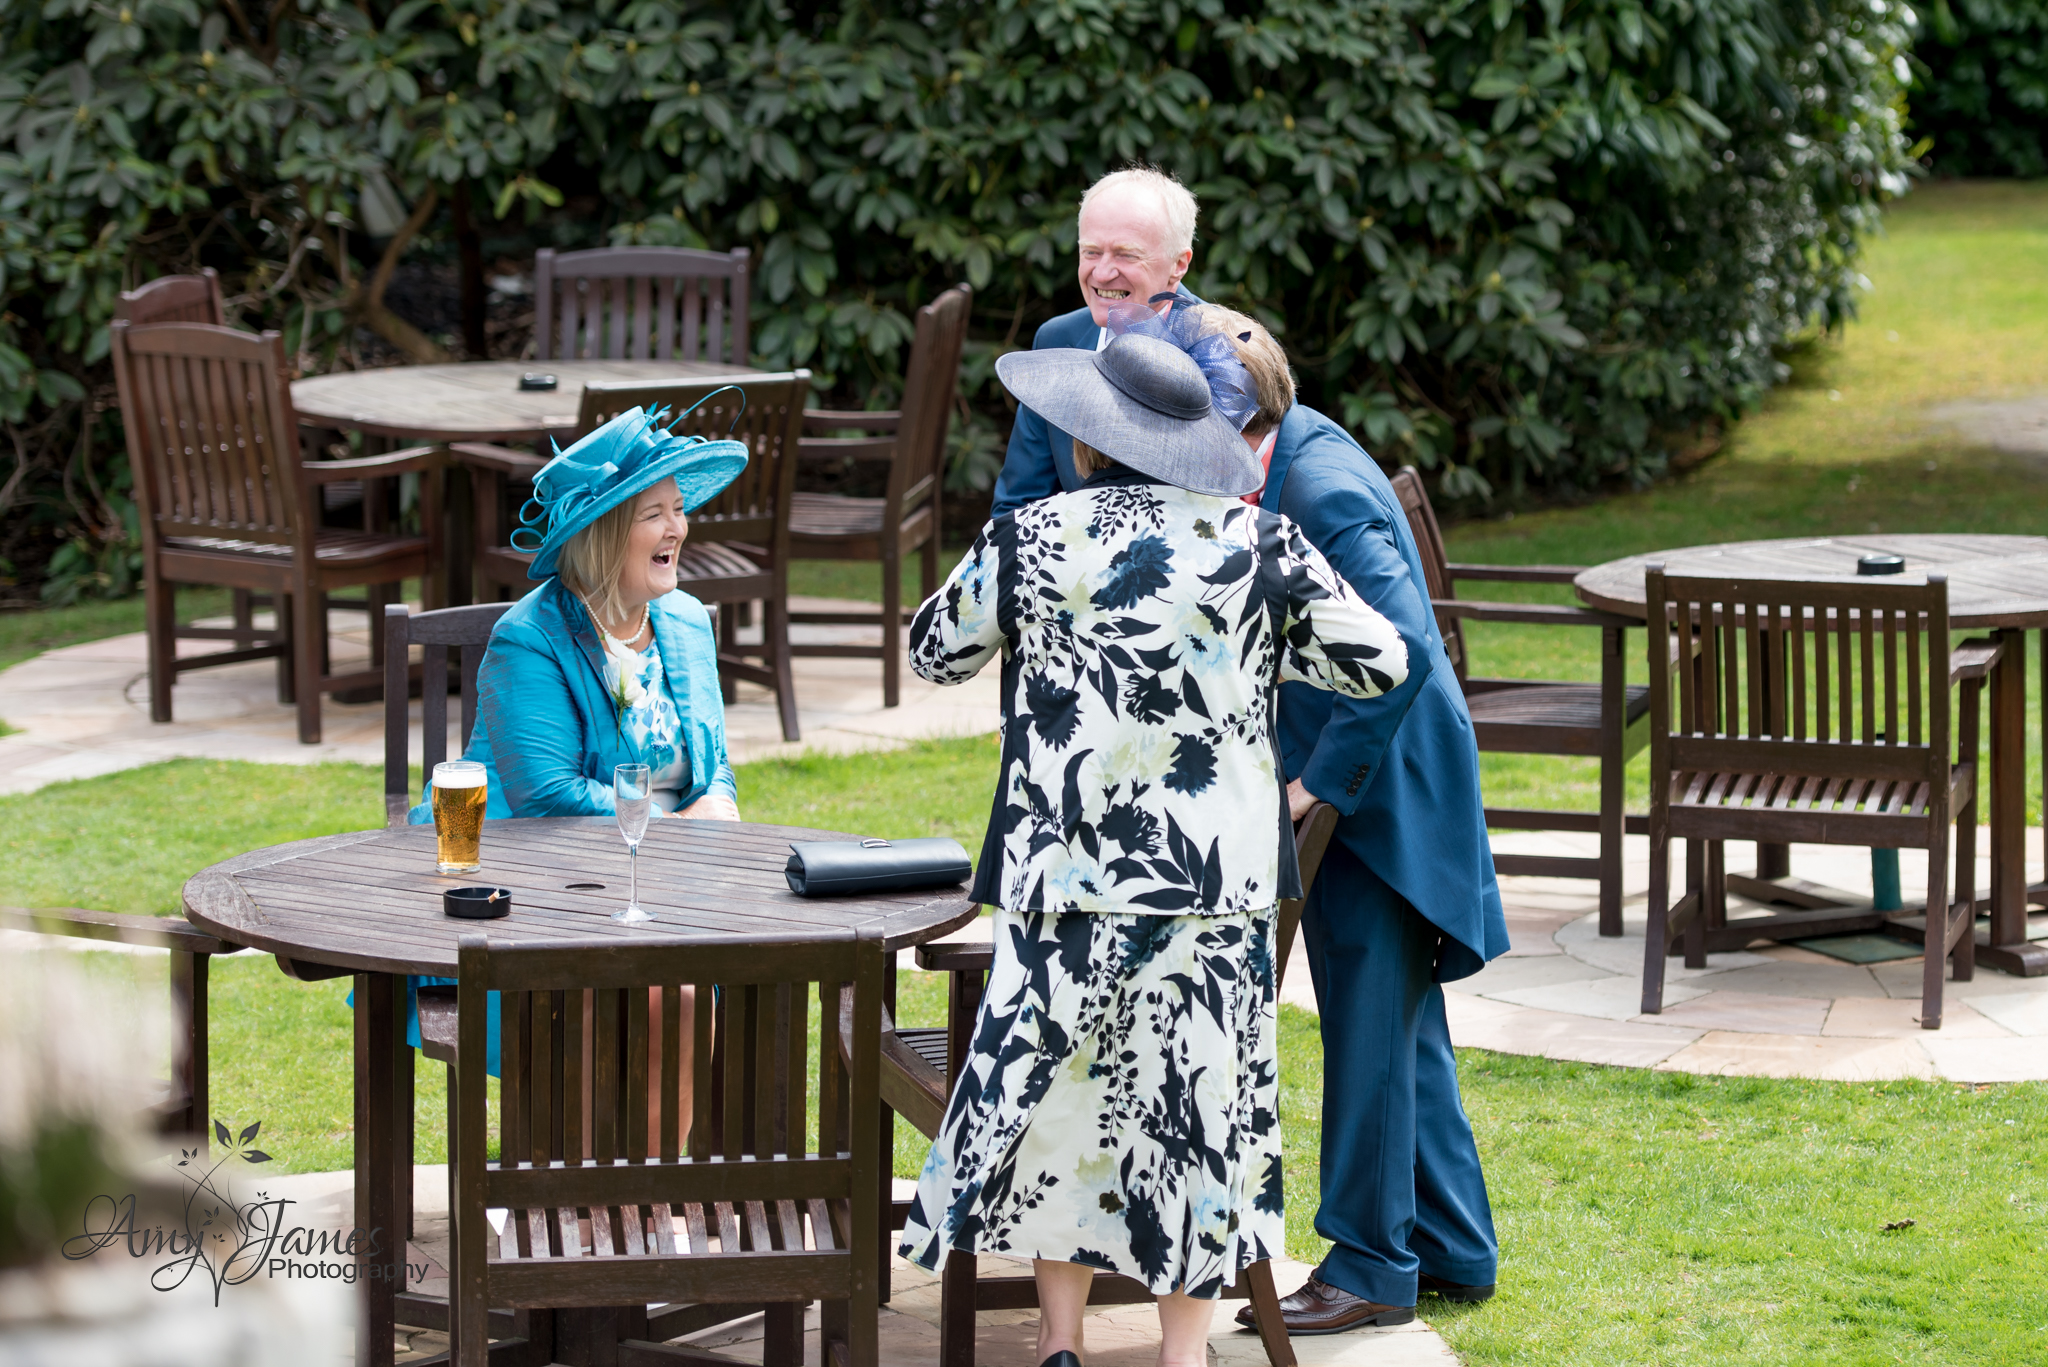 Frimley Hall Hotel Wedding Photographer Hampshire - Fleet wedding photographer-104.jpg